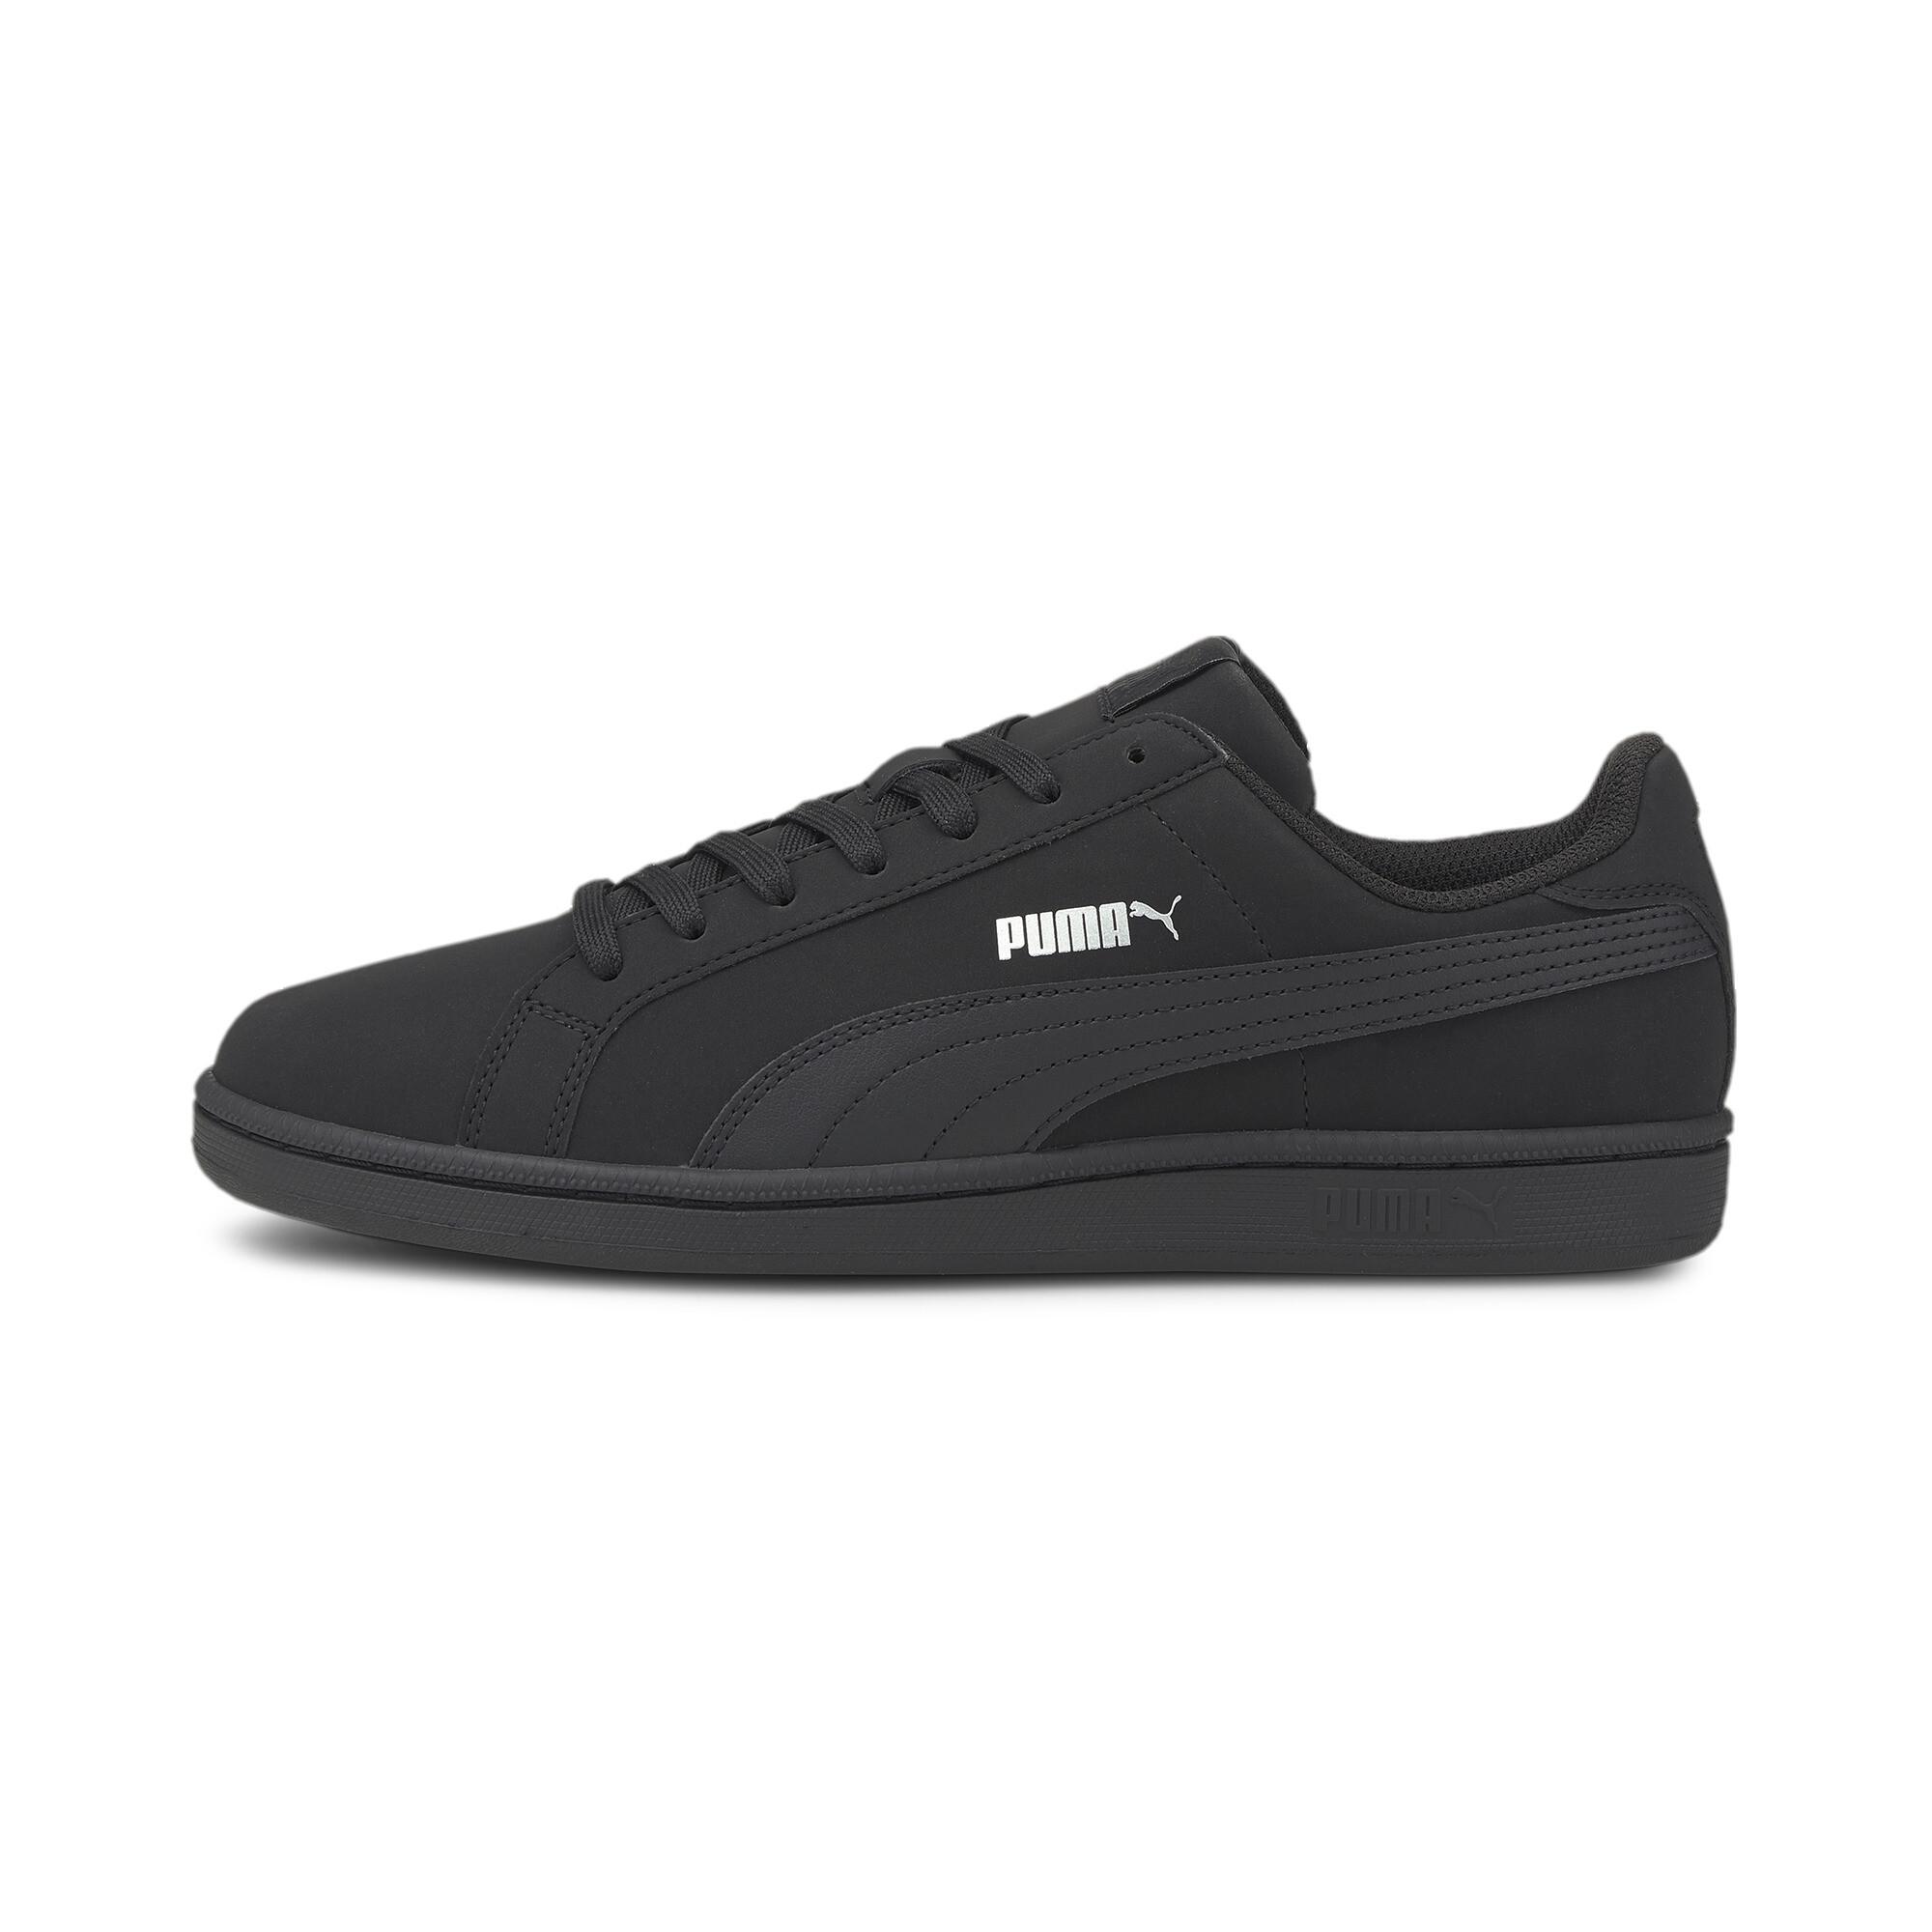 Indexbild 20 - PUMA Smash Buck Sneaker Unisex Schuhe Sport Classics Neu